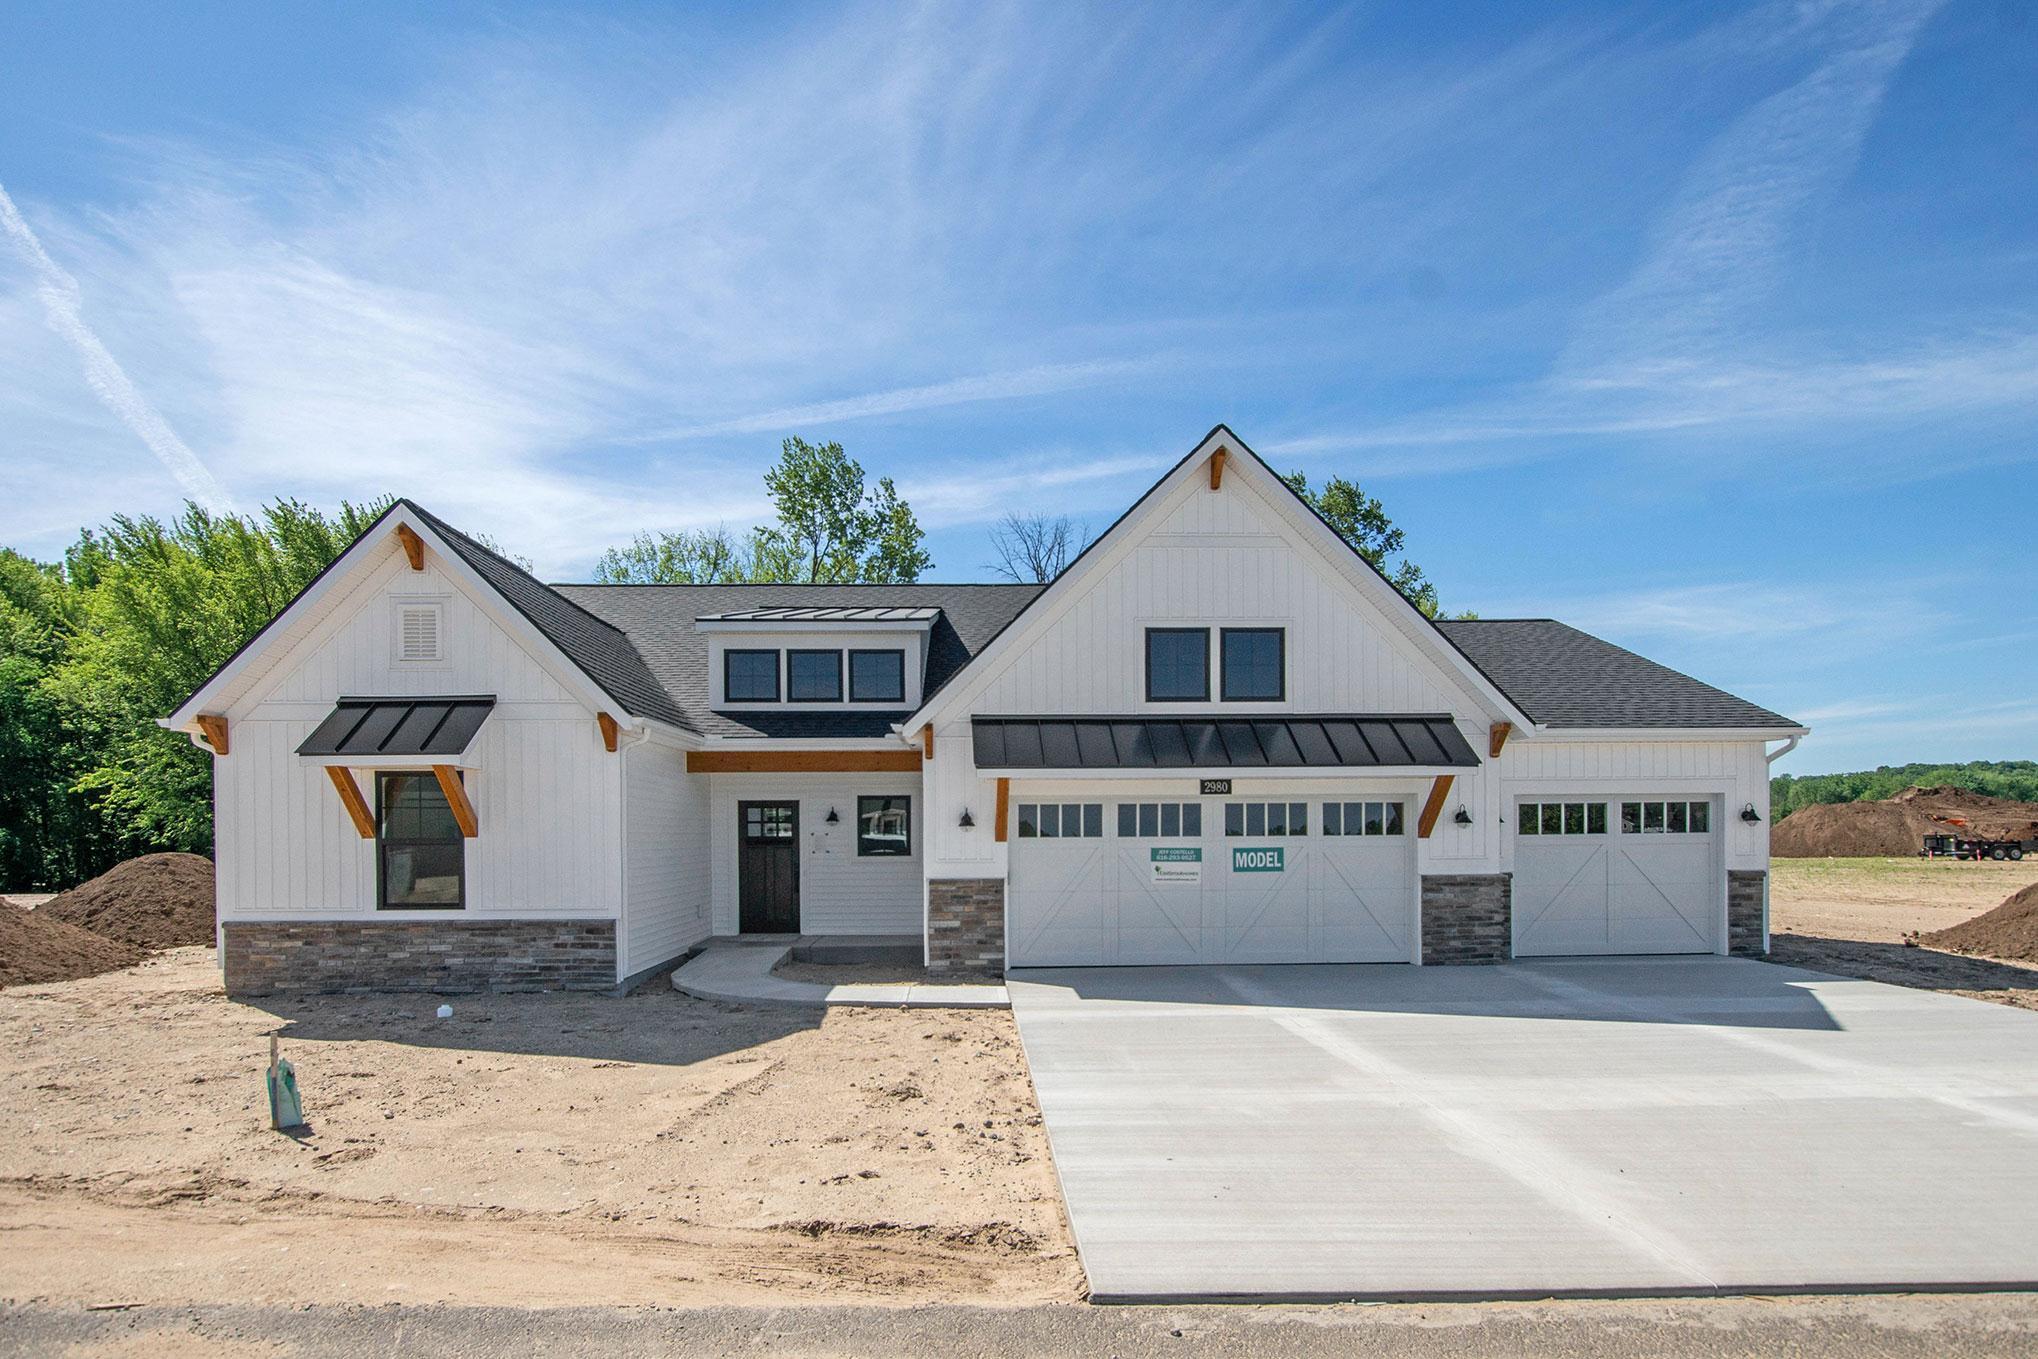 'Riverbend' by Eastbrook Homes Inc. in Grand Rapids